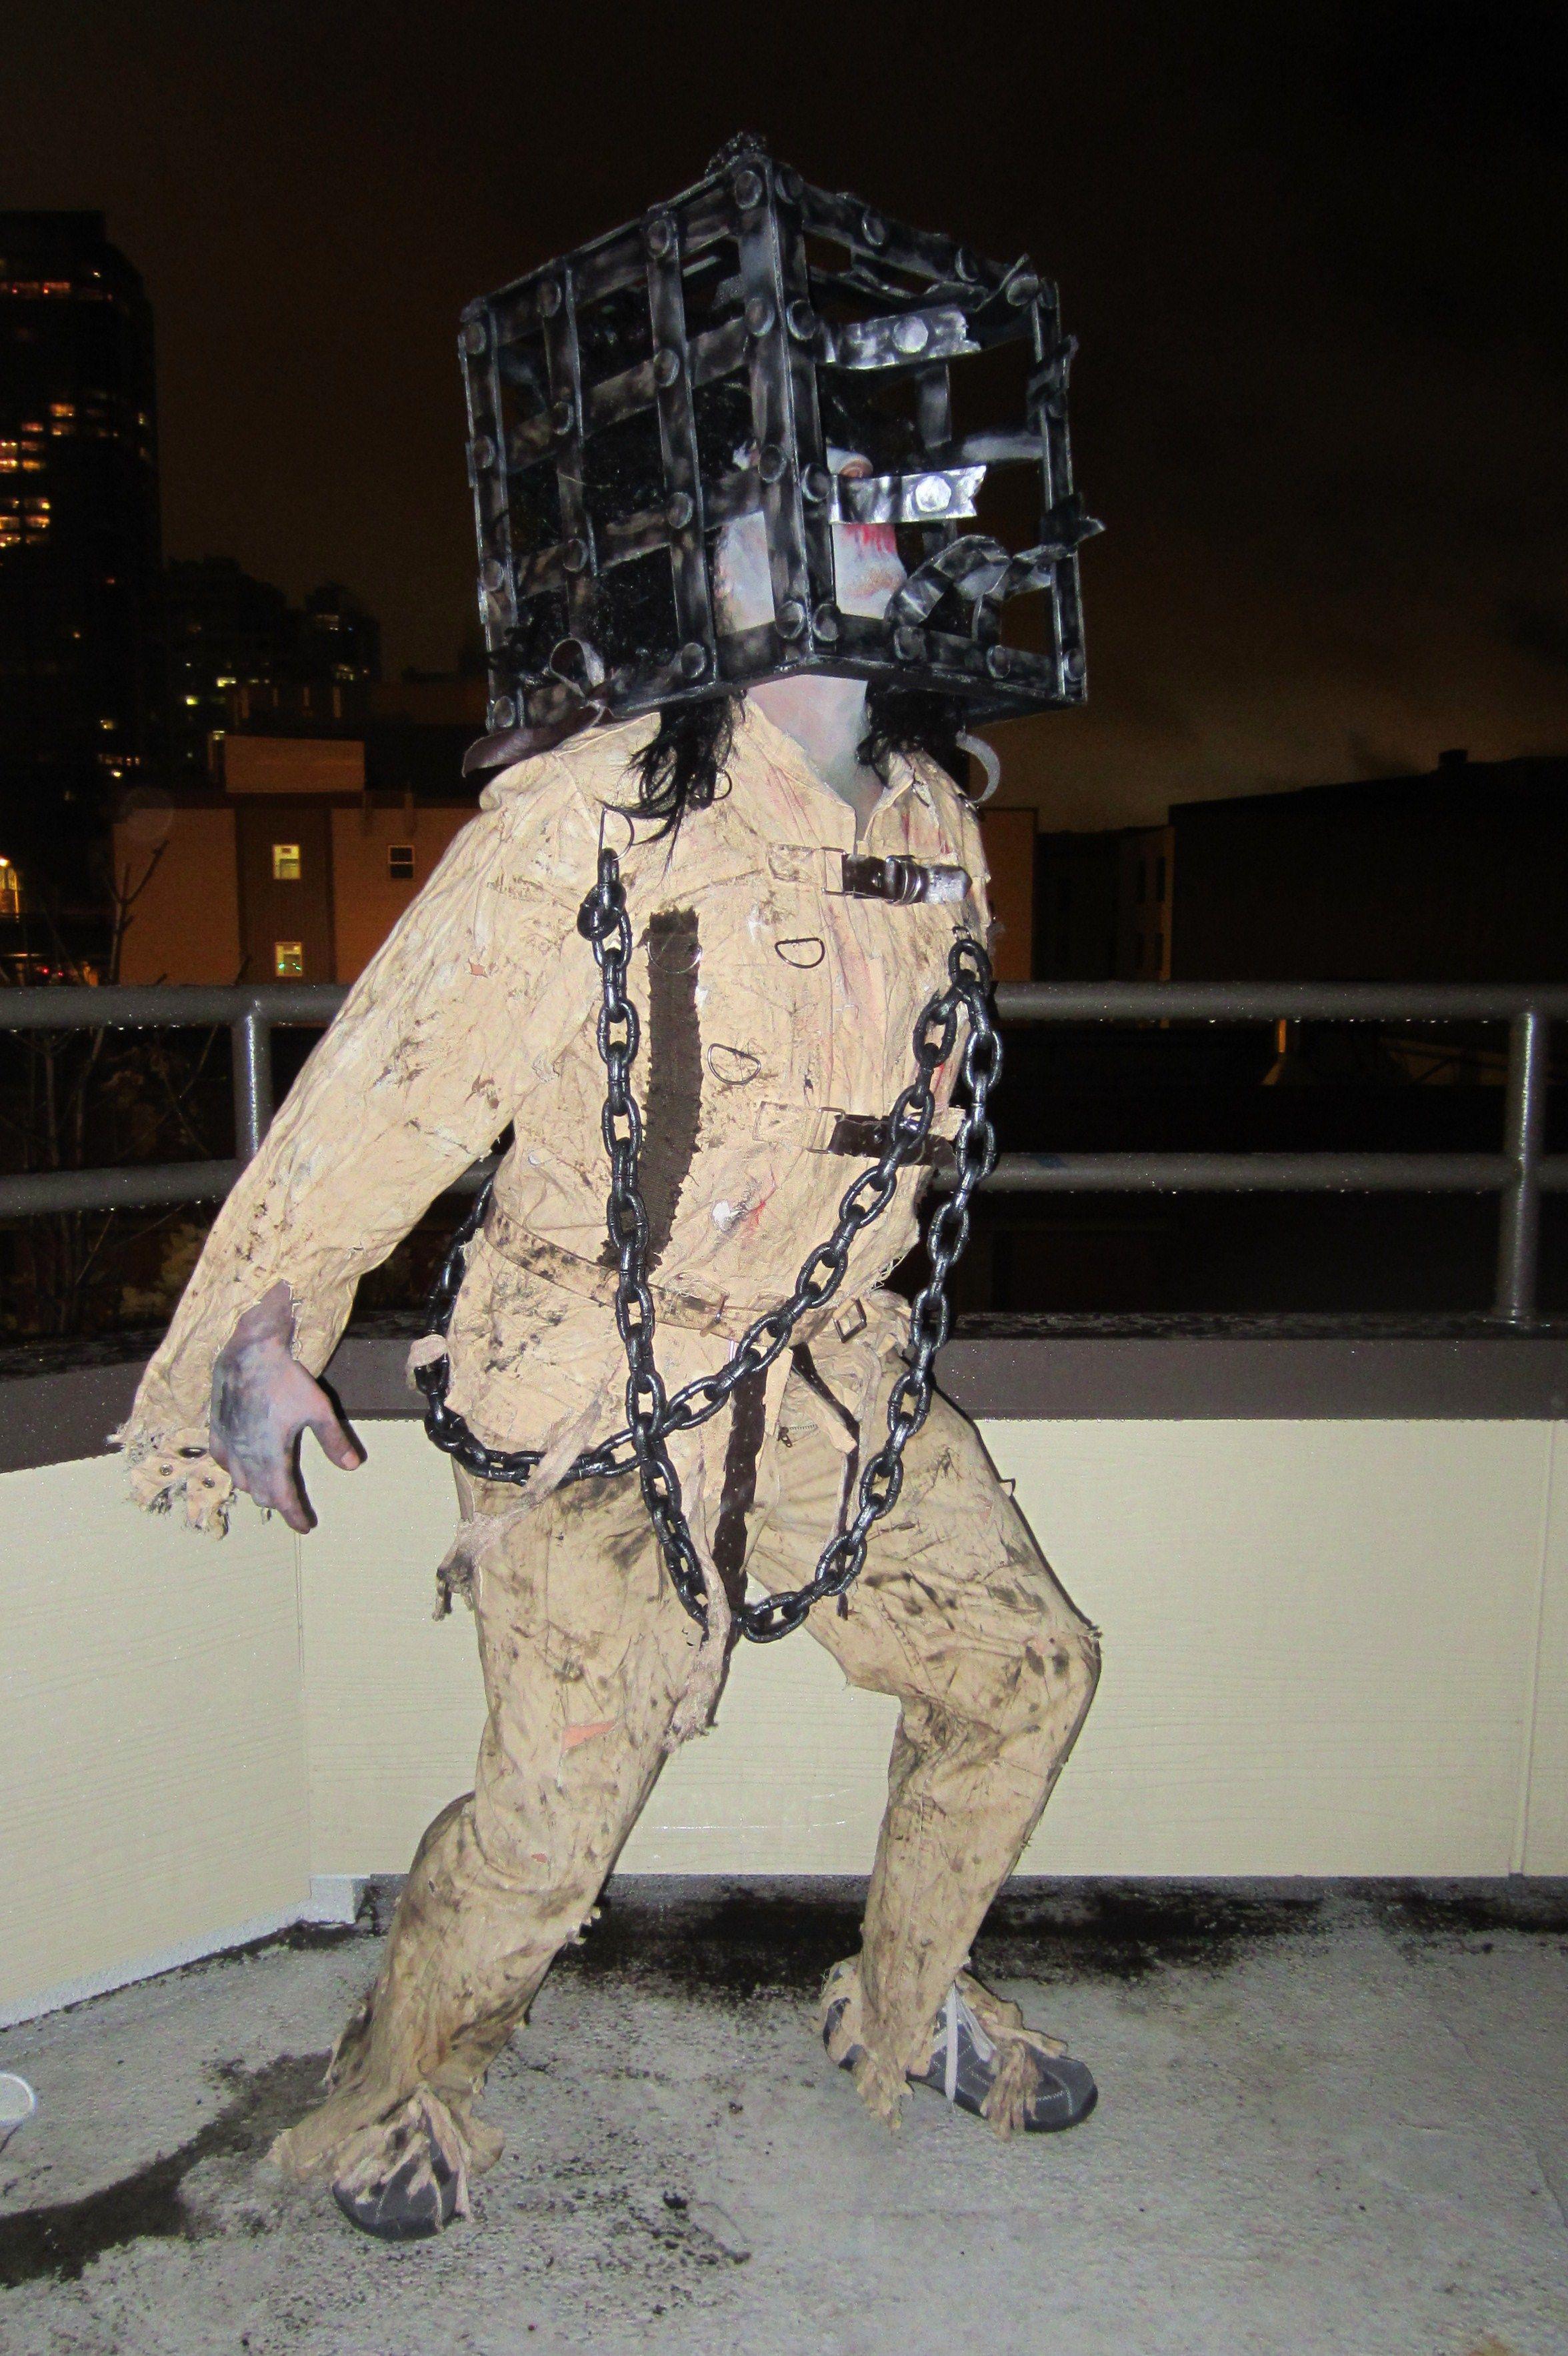 The Jackal 13 Ghosts & The Jackal 13 Ghosts | Halloween Costumes | Pinterest | Halloween ...